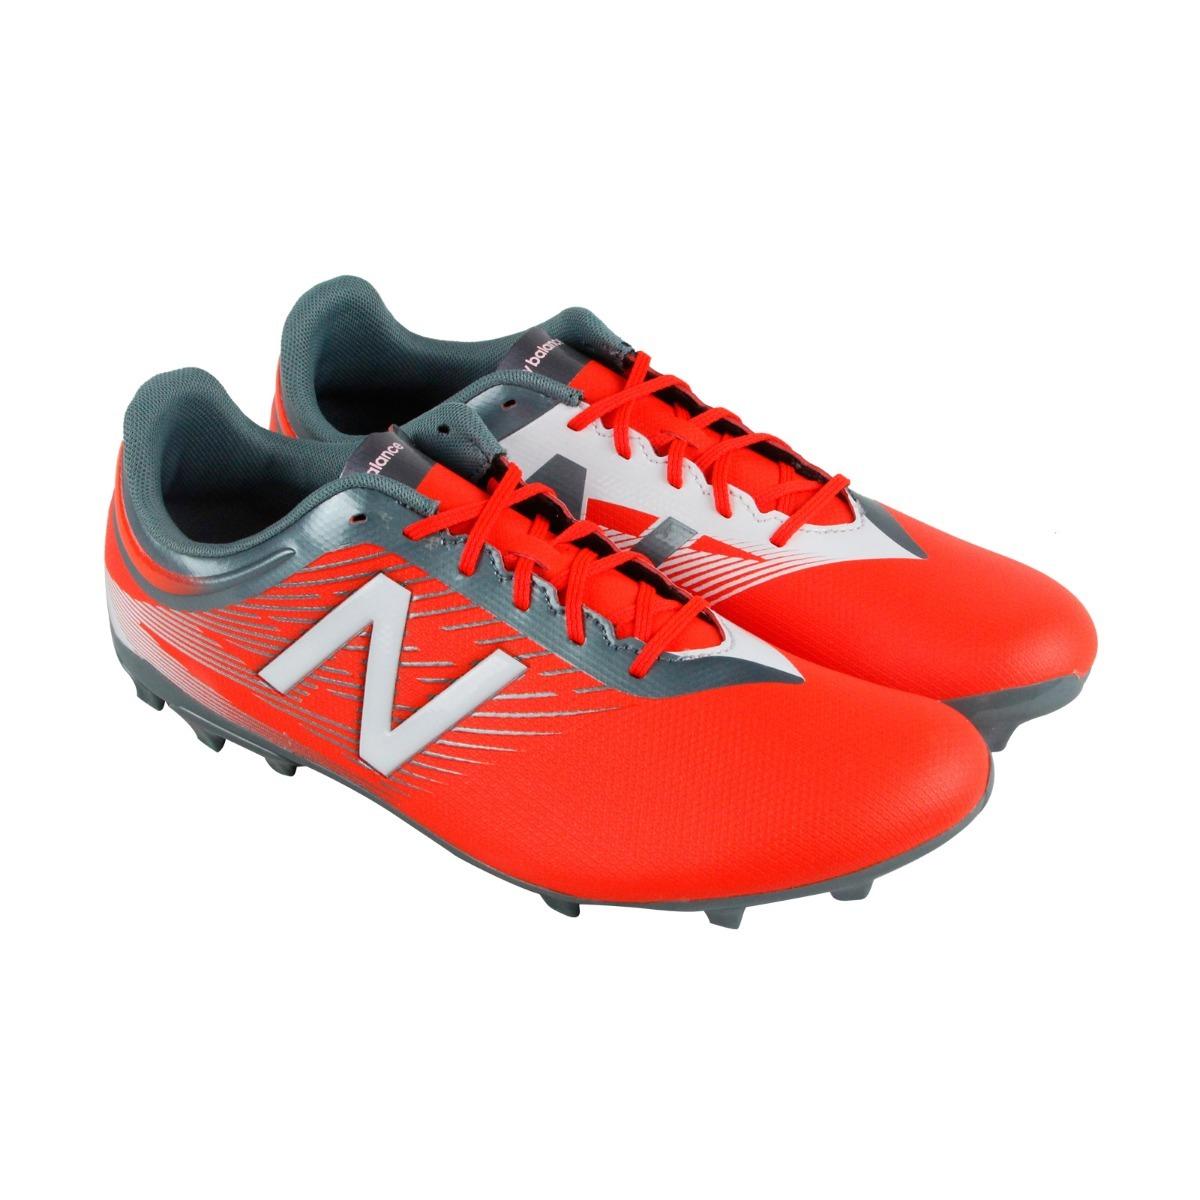 Dispatch Ii Balance Futbol Furon Msfudaot No De New Zapatos